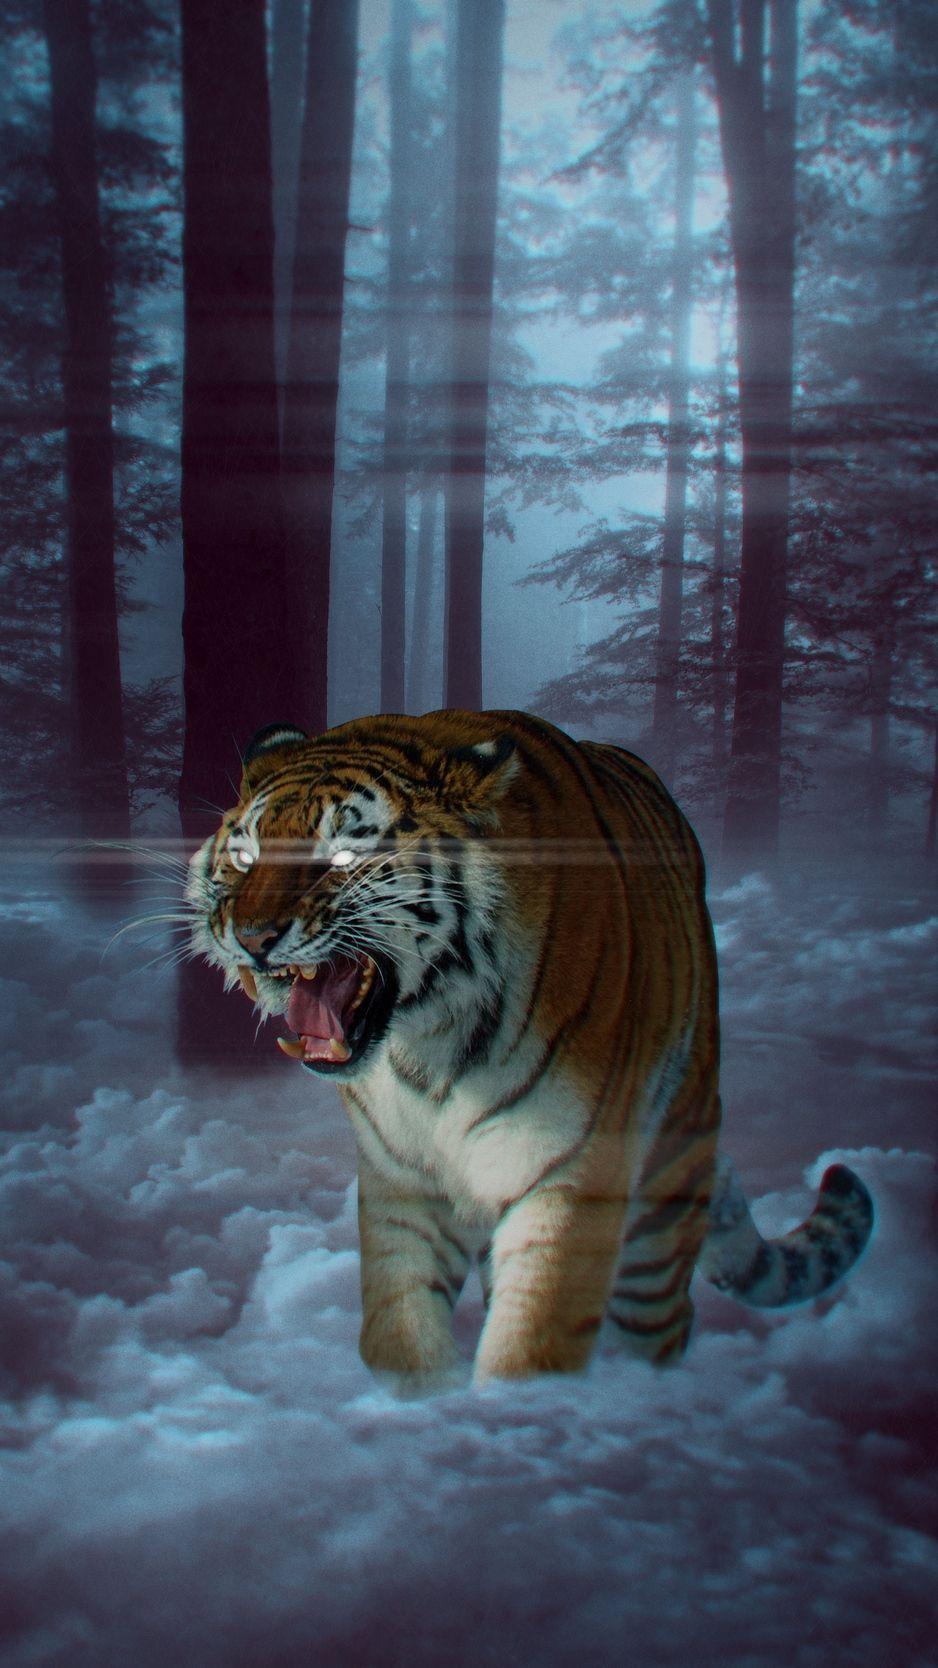 Iphone Xs Max Animal Wallpaper In 2020 Animal Planet Animal Wallpaper Animals